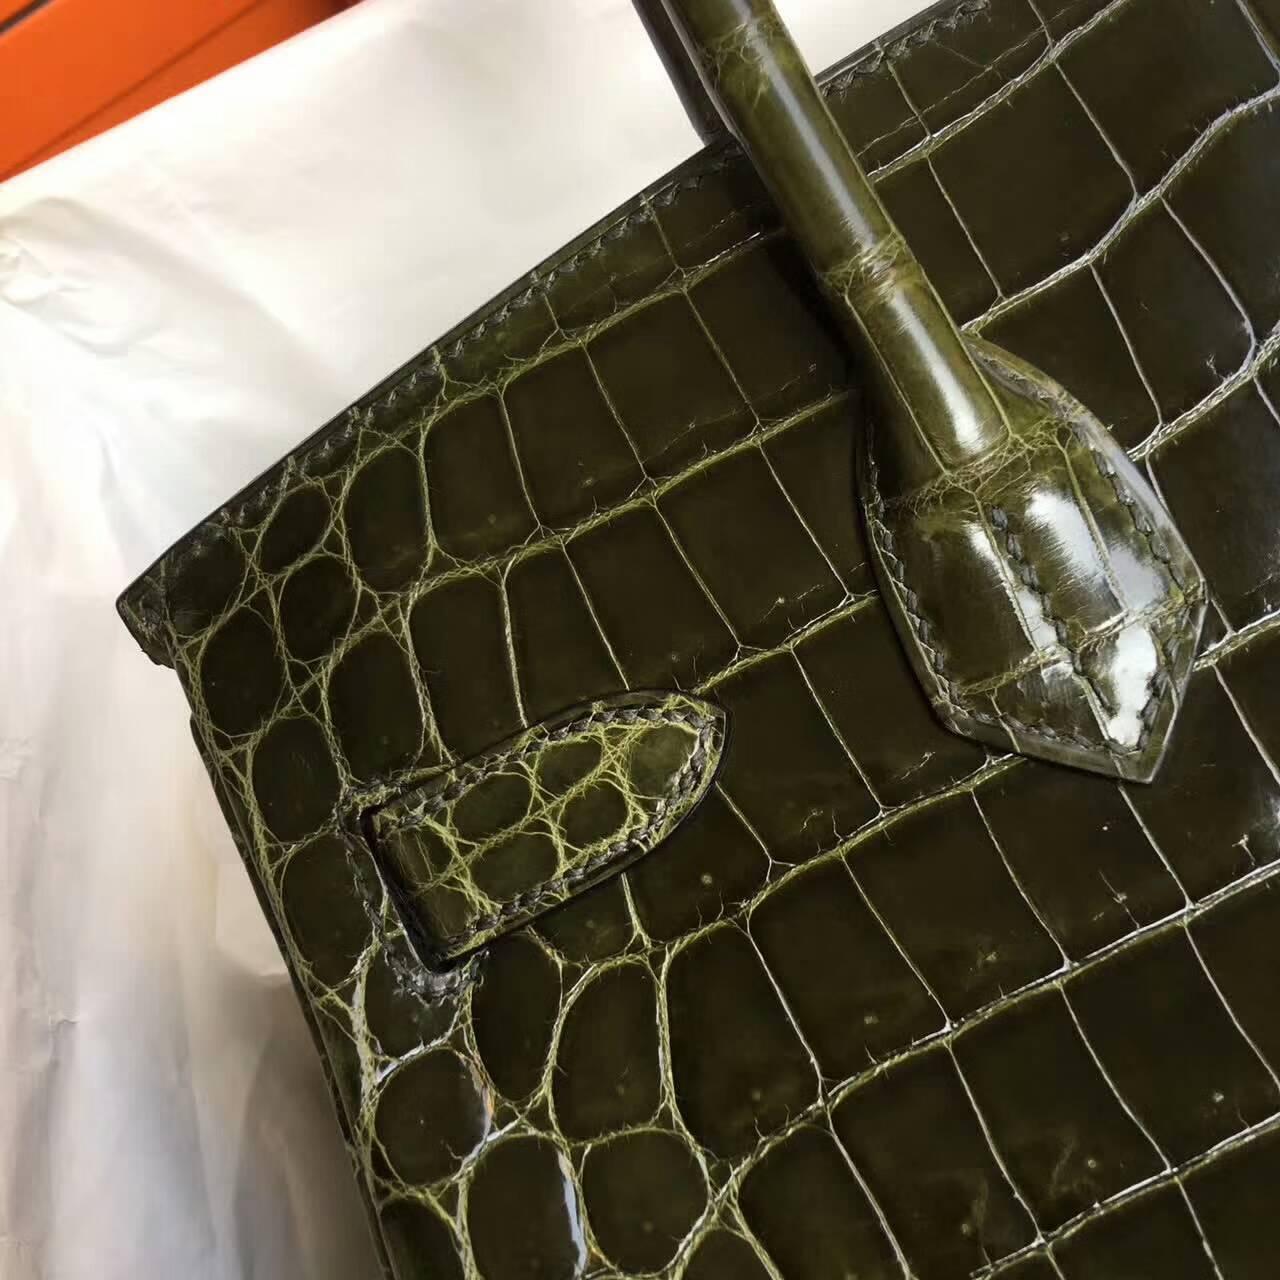 Birkin铂金包 Hermes包包 30cm Shiny Niloticus Crocodile 雾面两点非洲原产尼罗鳄 61 Vert Olive 橄榄绿 银扣